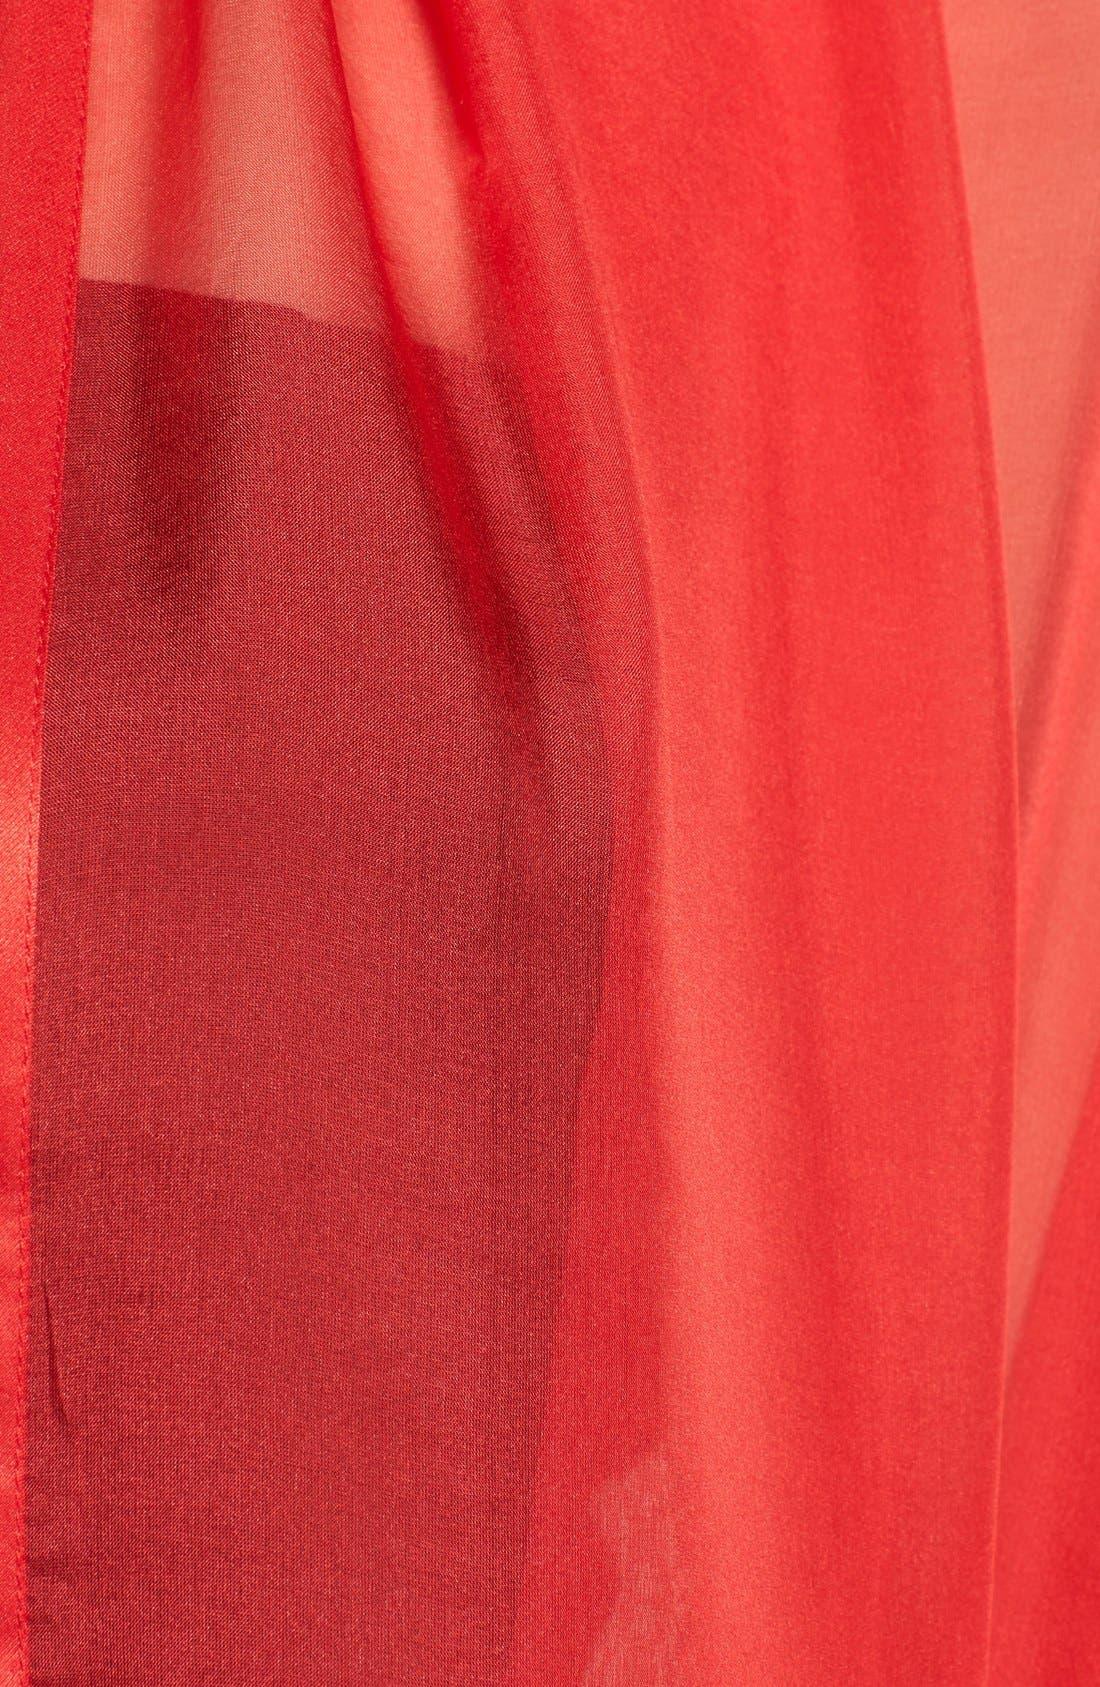 Satin Border Silk Wrap,                             Alternate thumbnail 46, color,